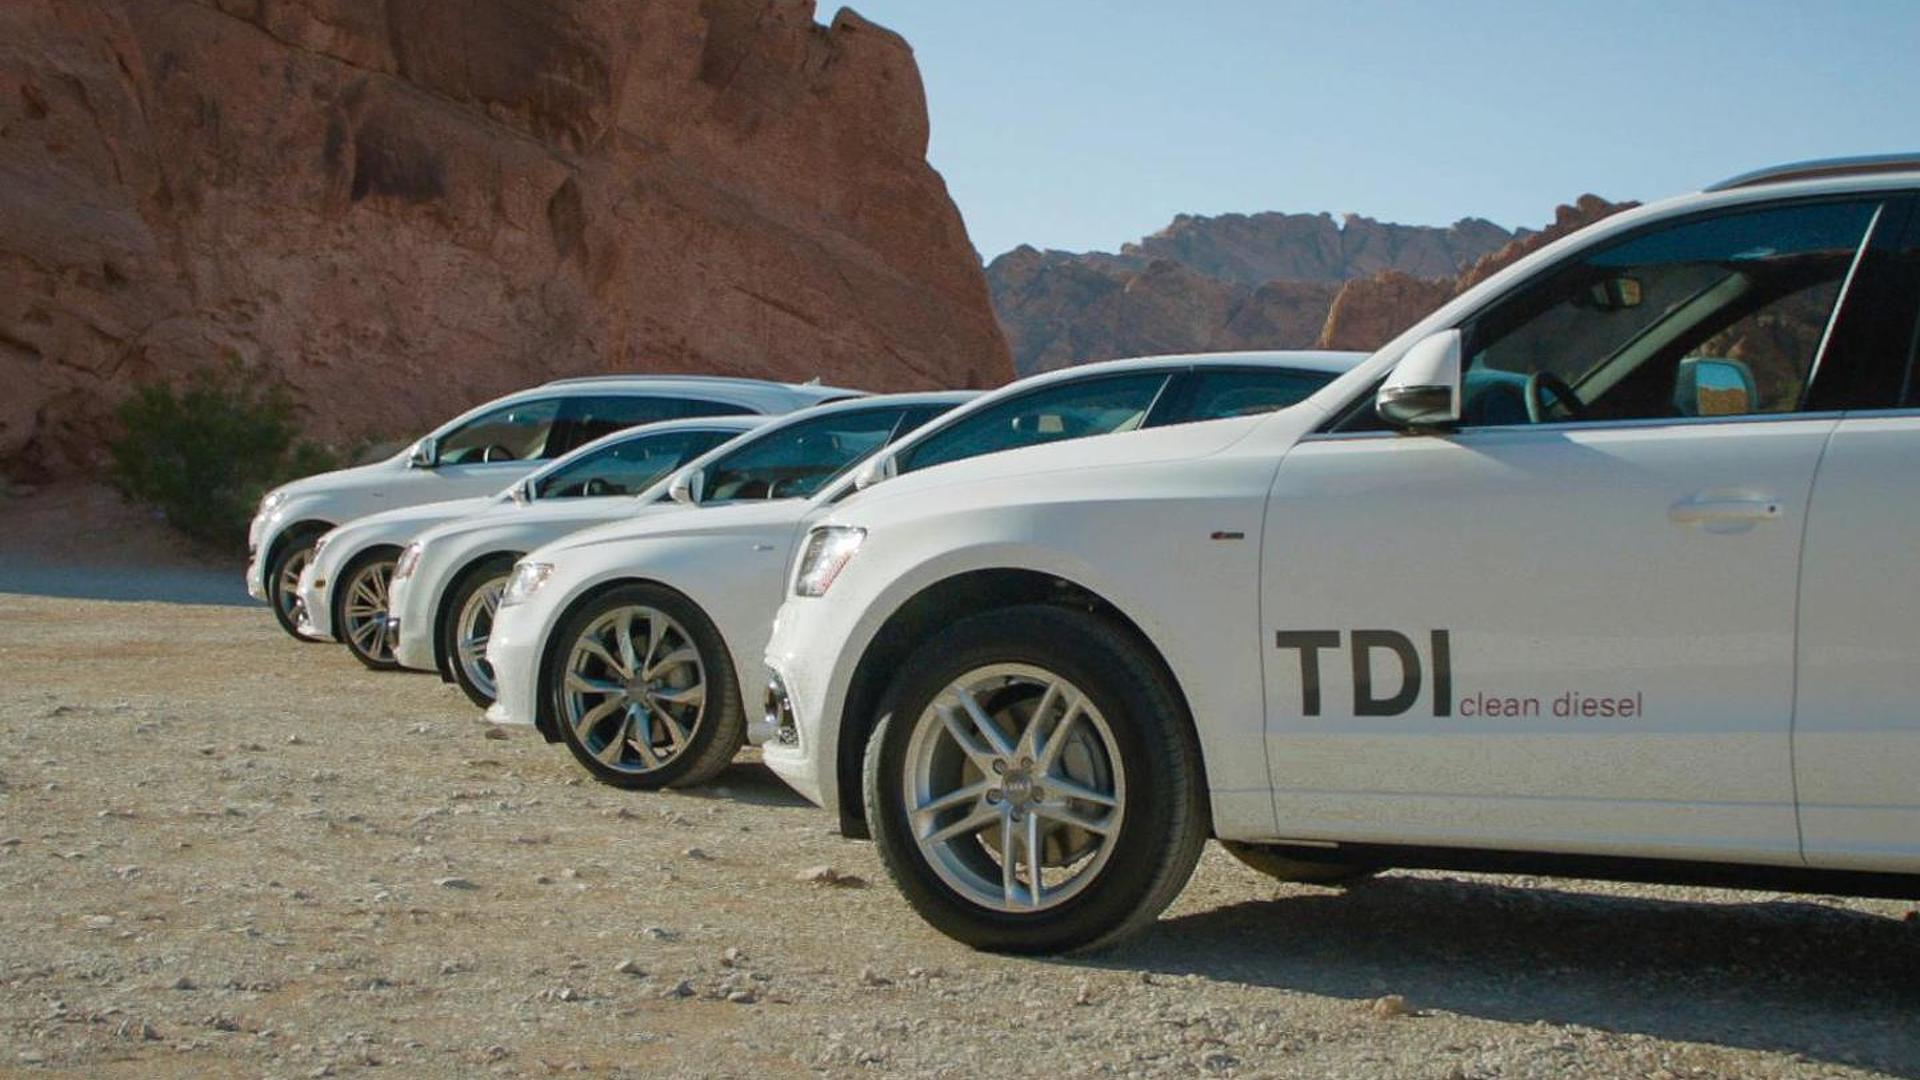 Audi To Buy Back Diesel Models In The US - Audi to buy